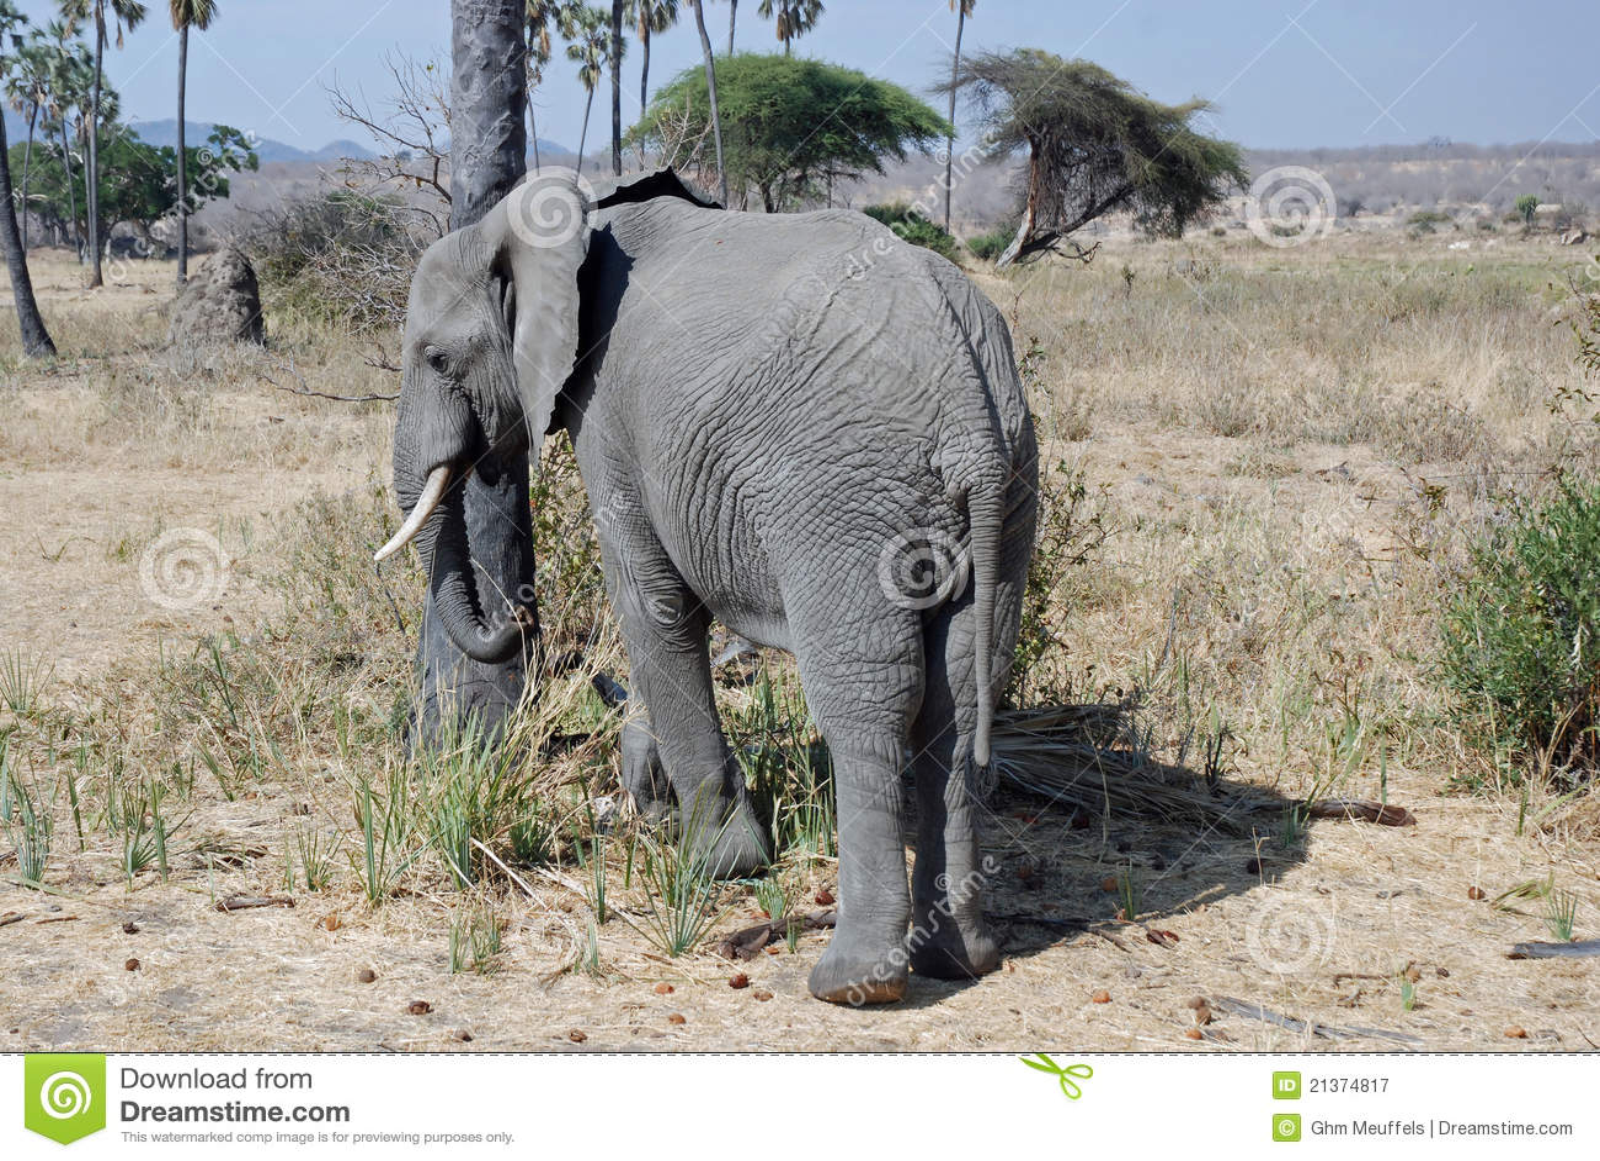 African Elephant with savannah woodland -Tanzania